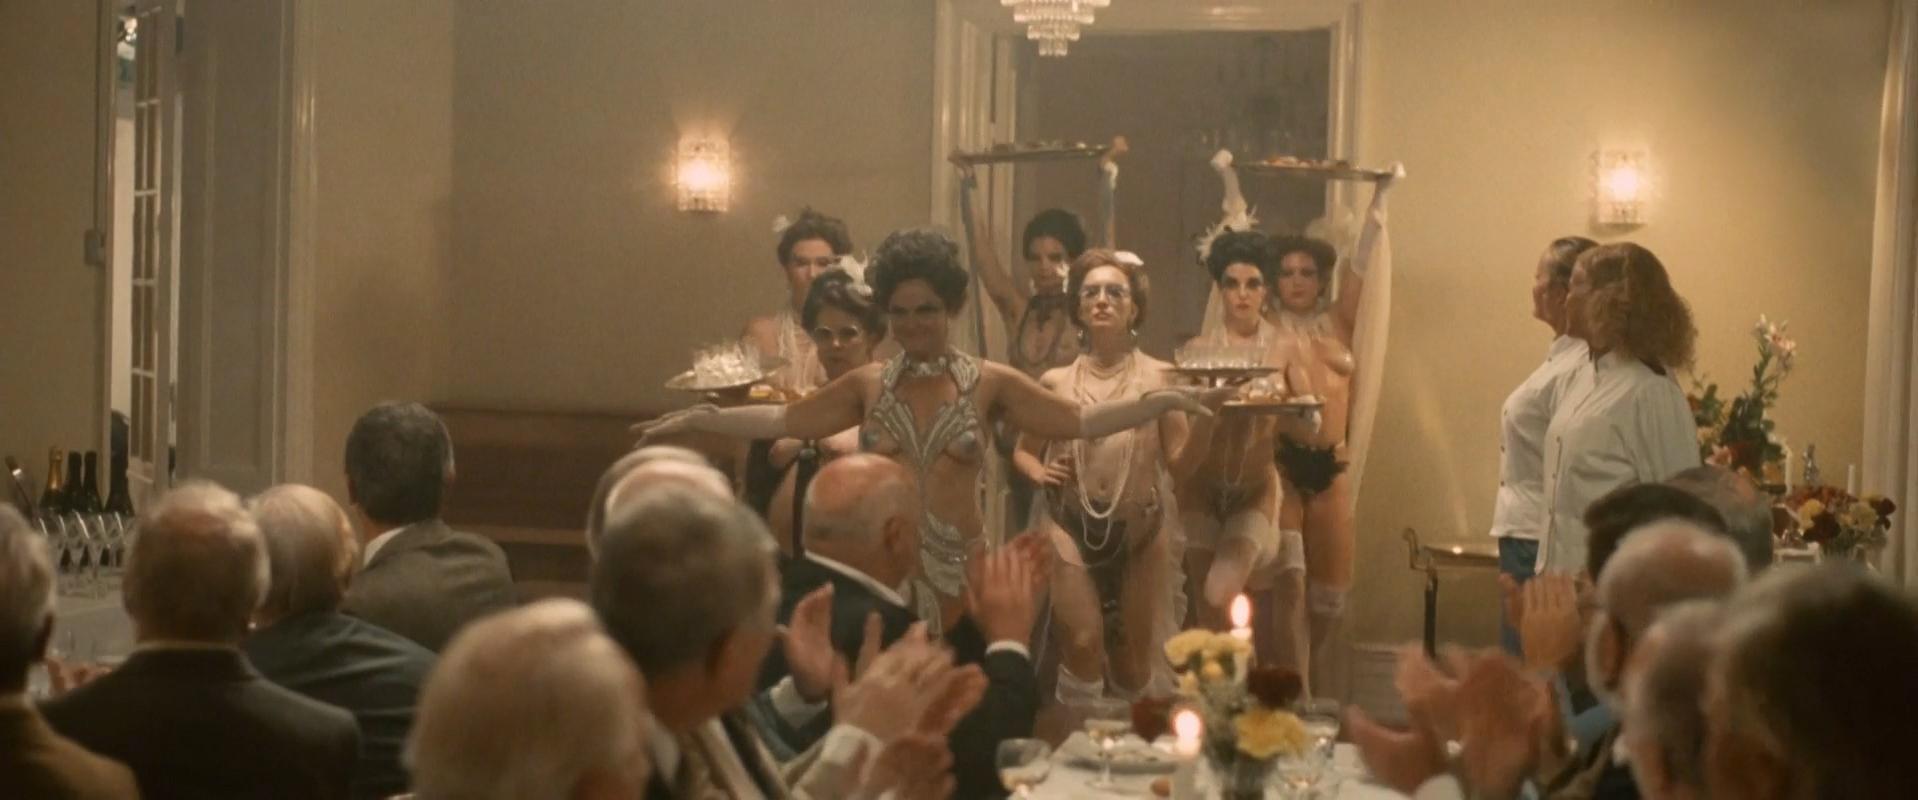 Pernilla August nude - Call Girl (2012)